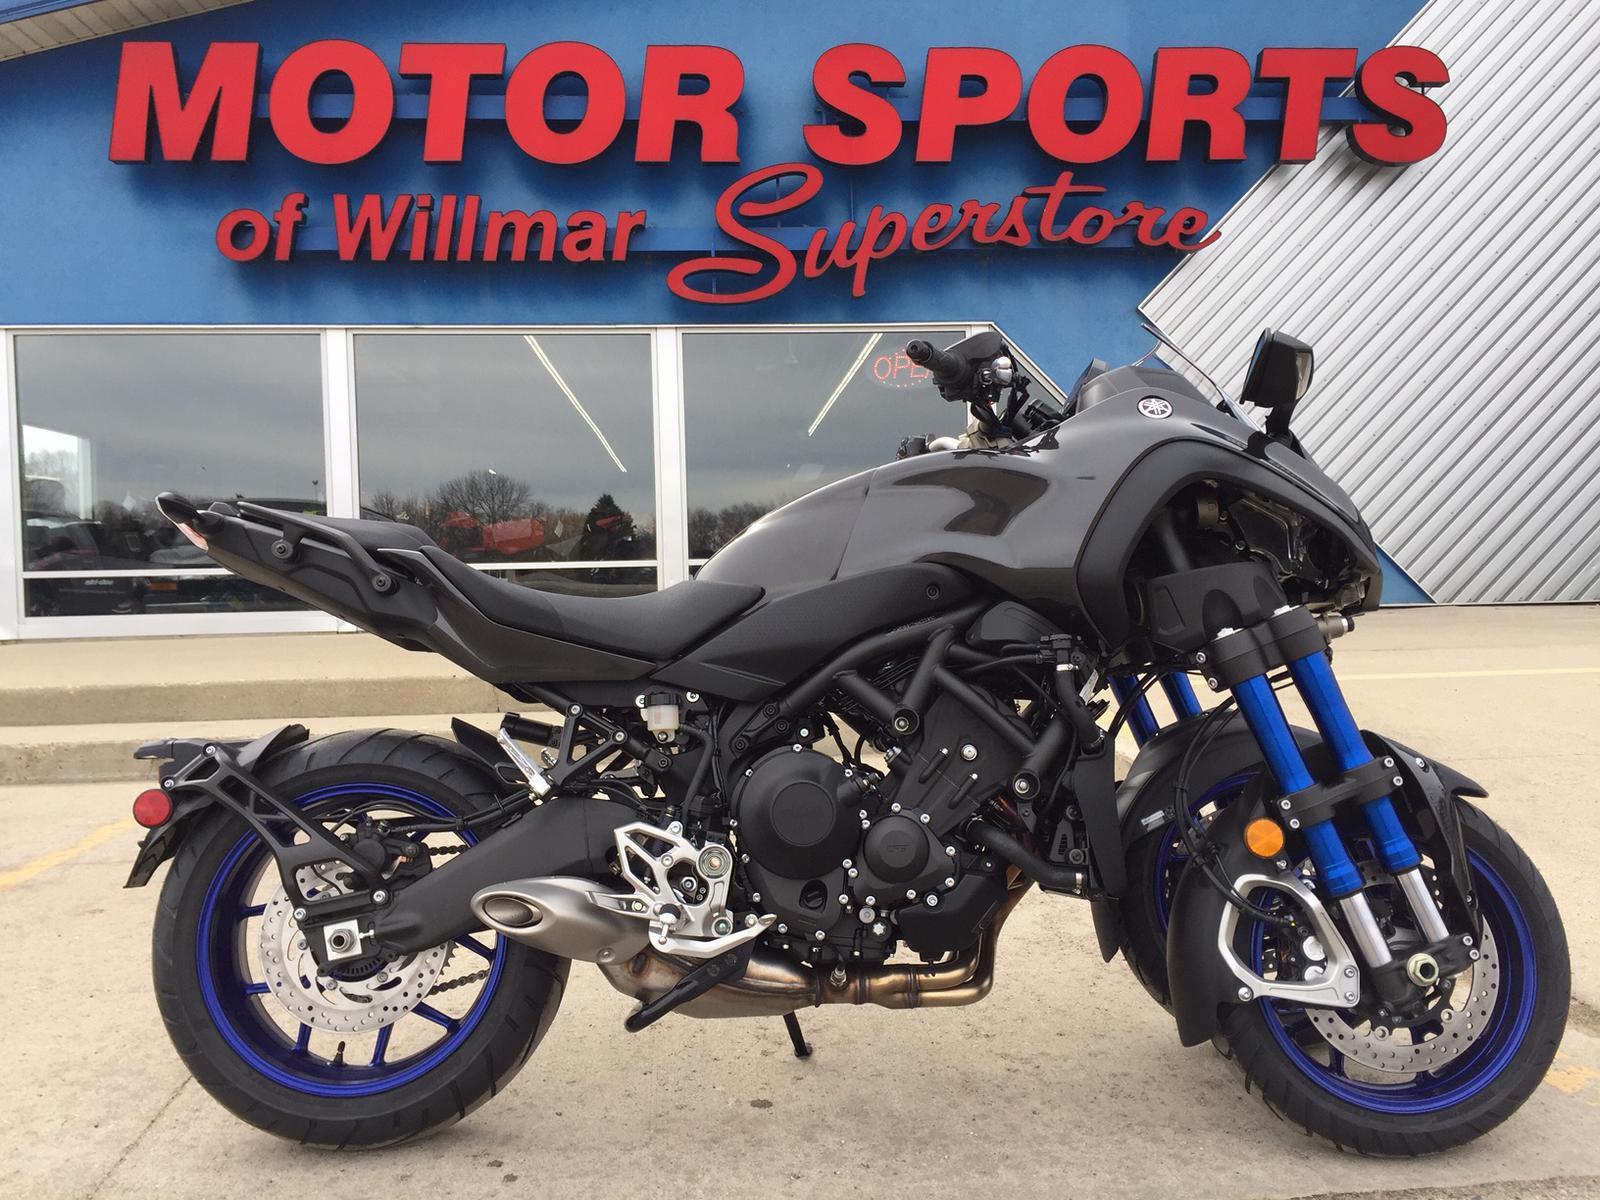 New ATV and Street Bikes Motor Sports of Willmar Willmar ...